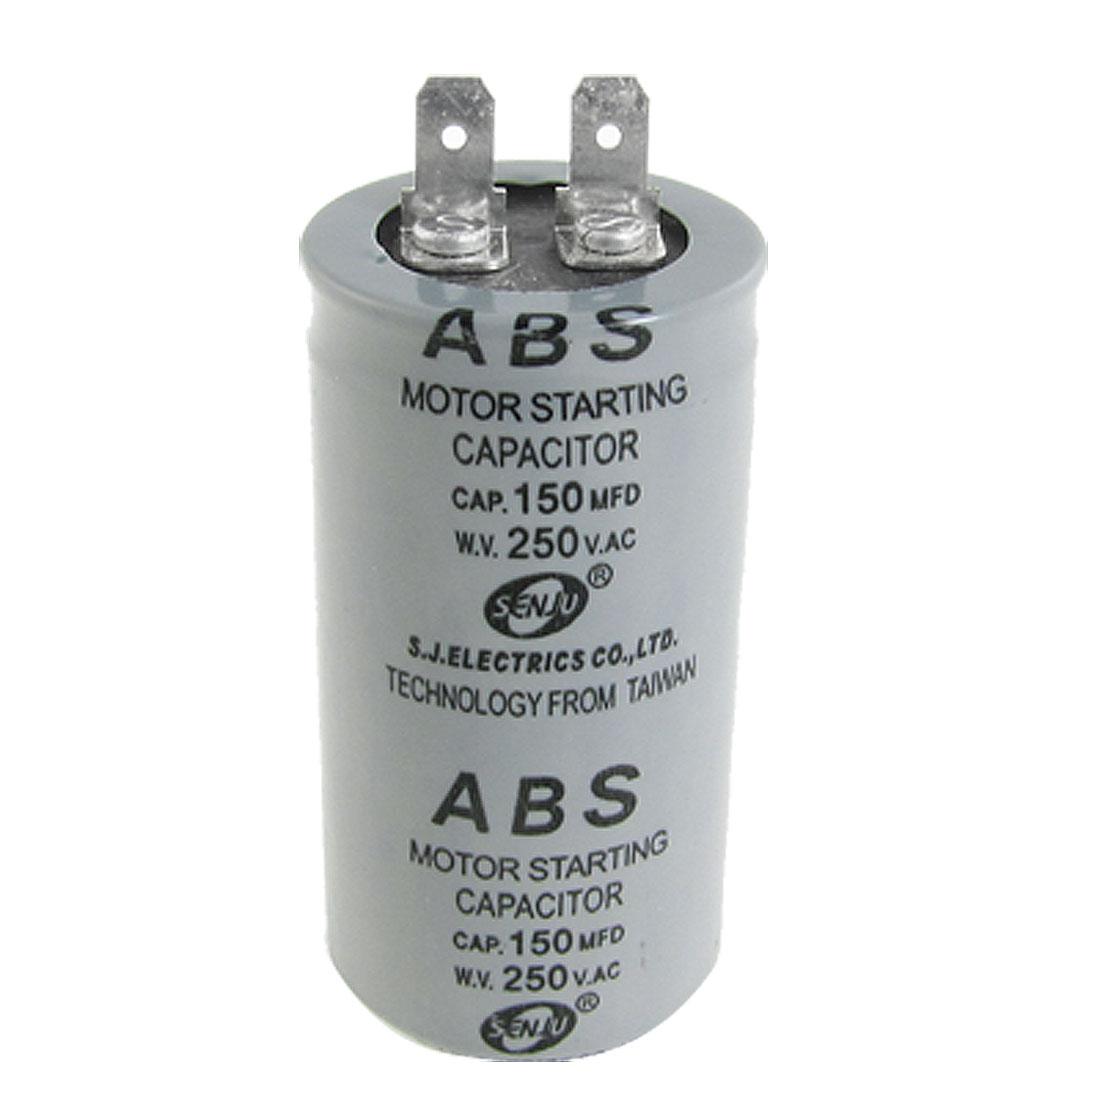 AC 250V 150MFD 150uF Capacitance Round Motor Starting Capacitor Gray